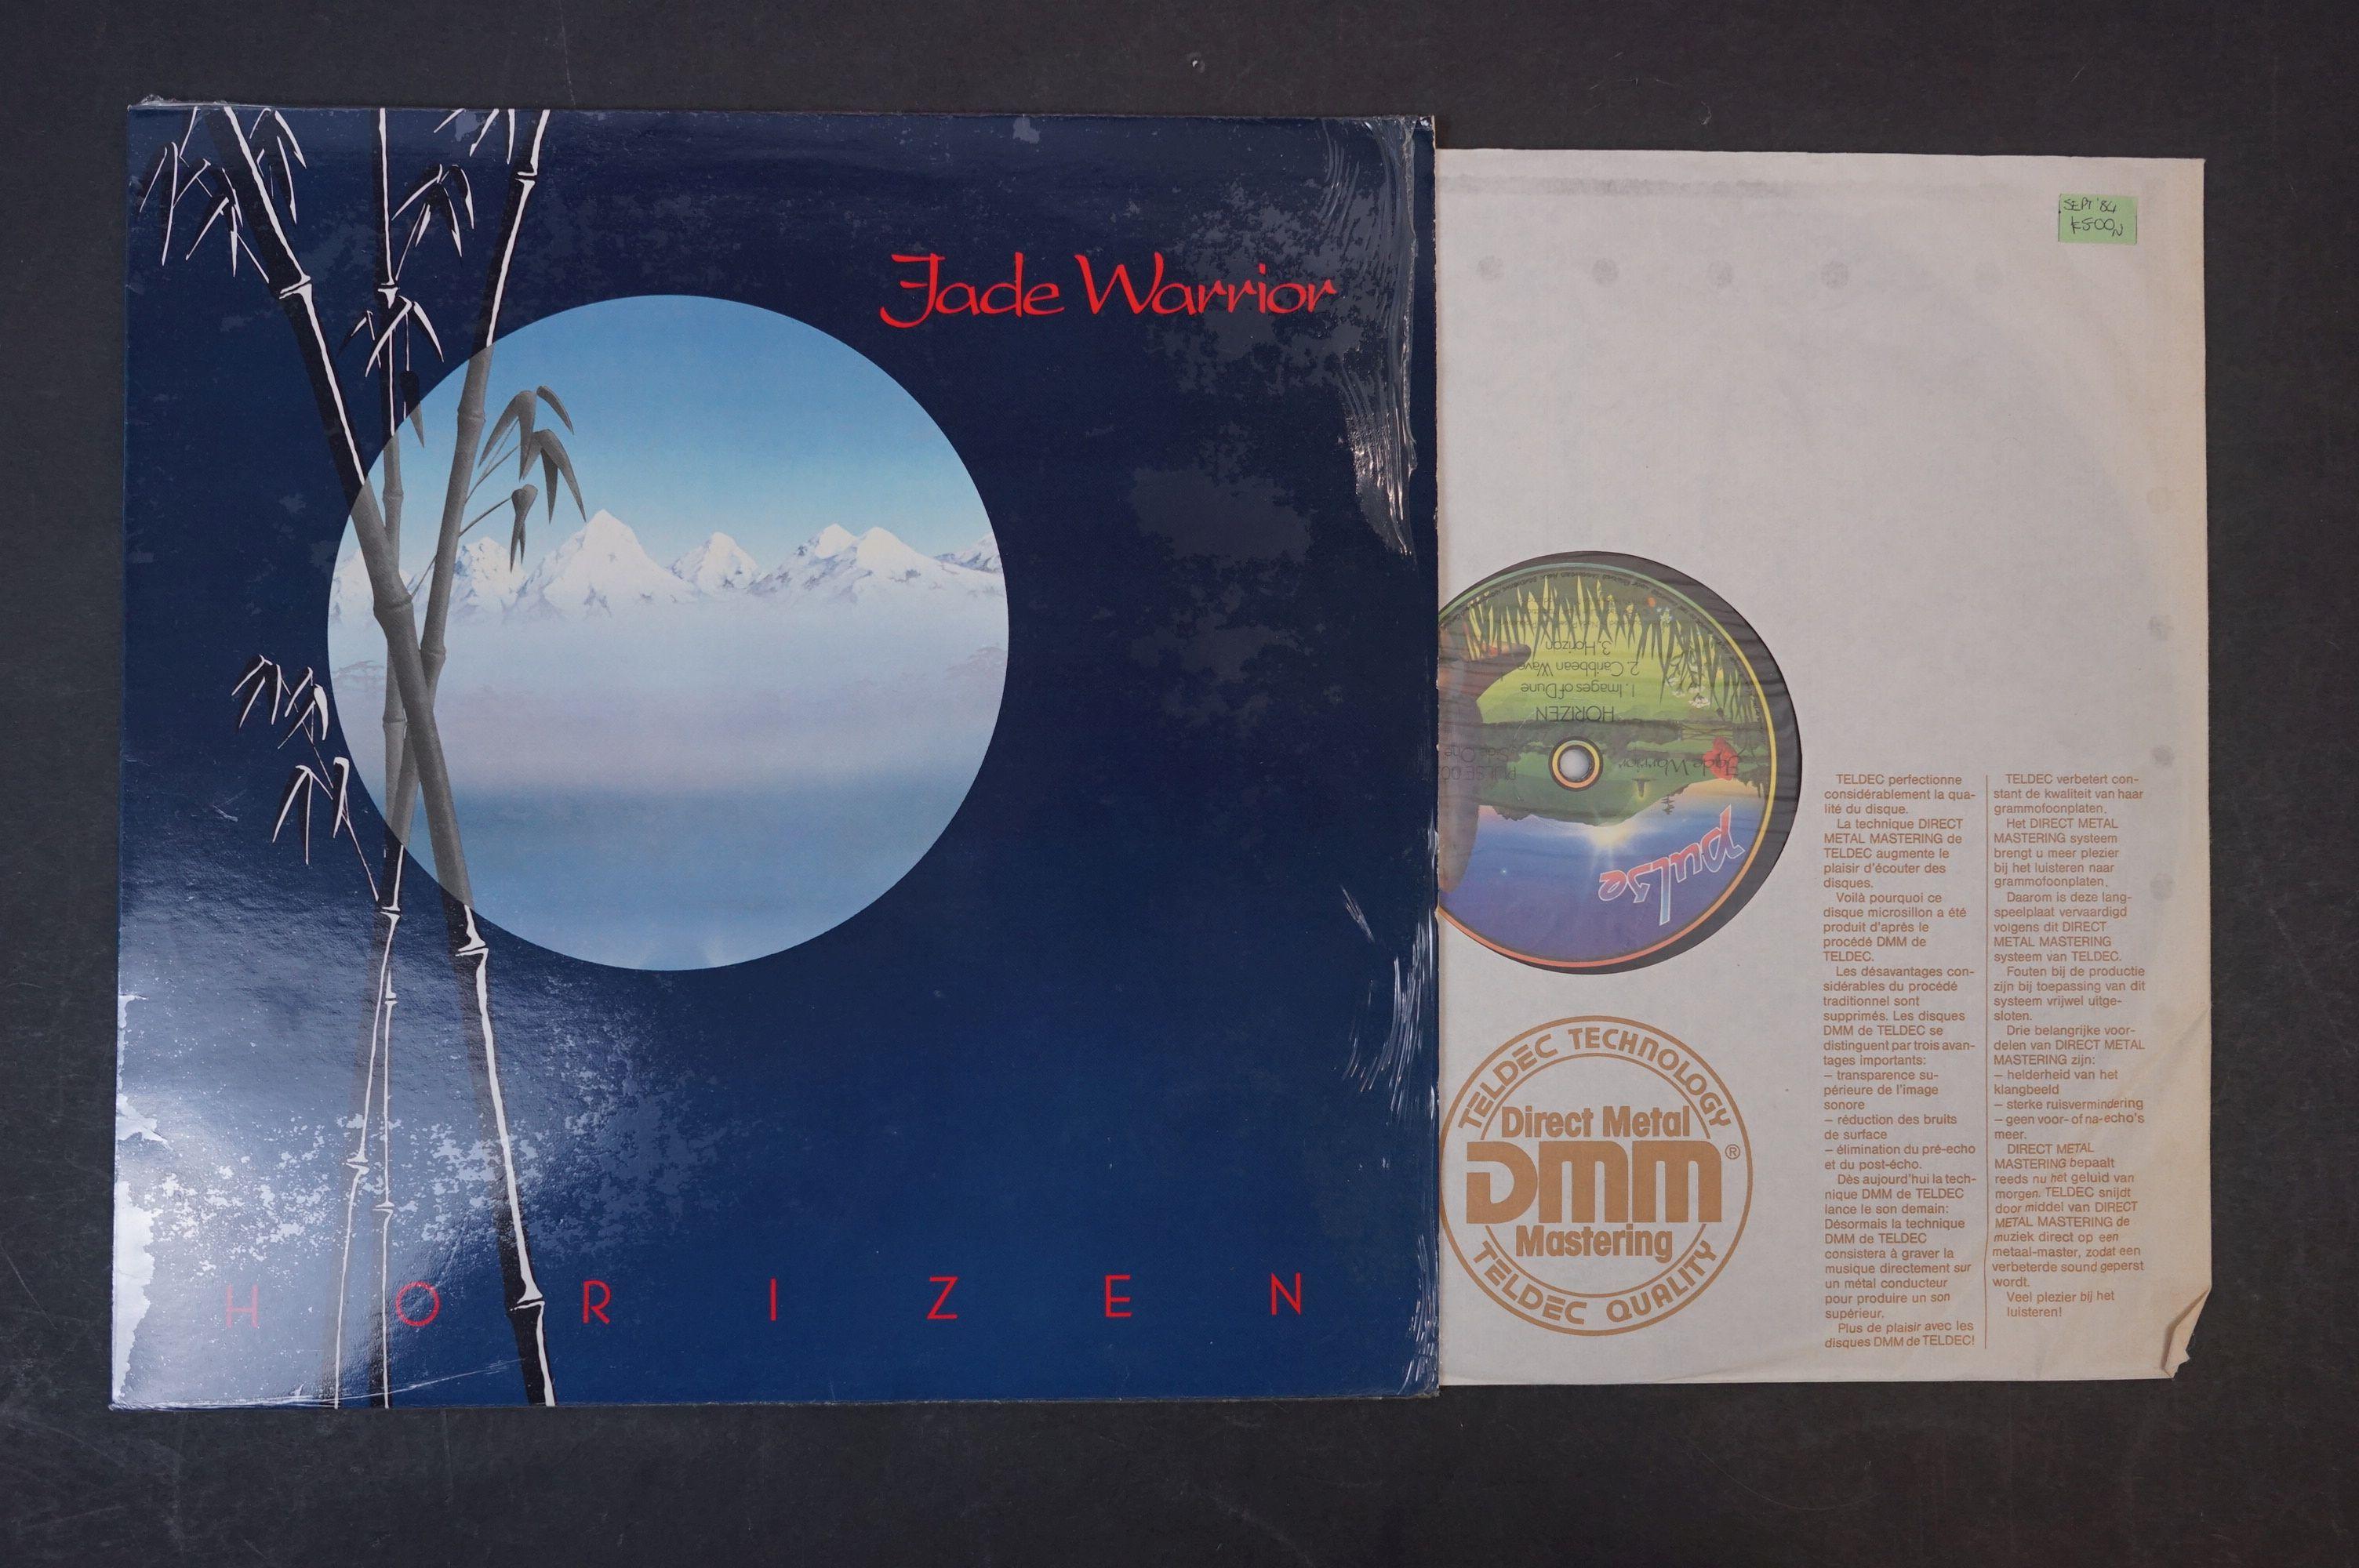 Vinyl - Four Jade Warrior LPs to include Last Autumn Dream LP on Vertigo Deluxe 6360079 gatefold - Image 4 of 9